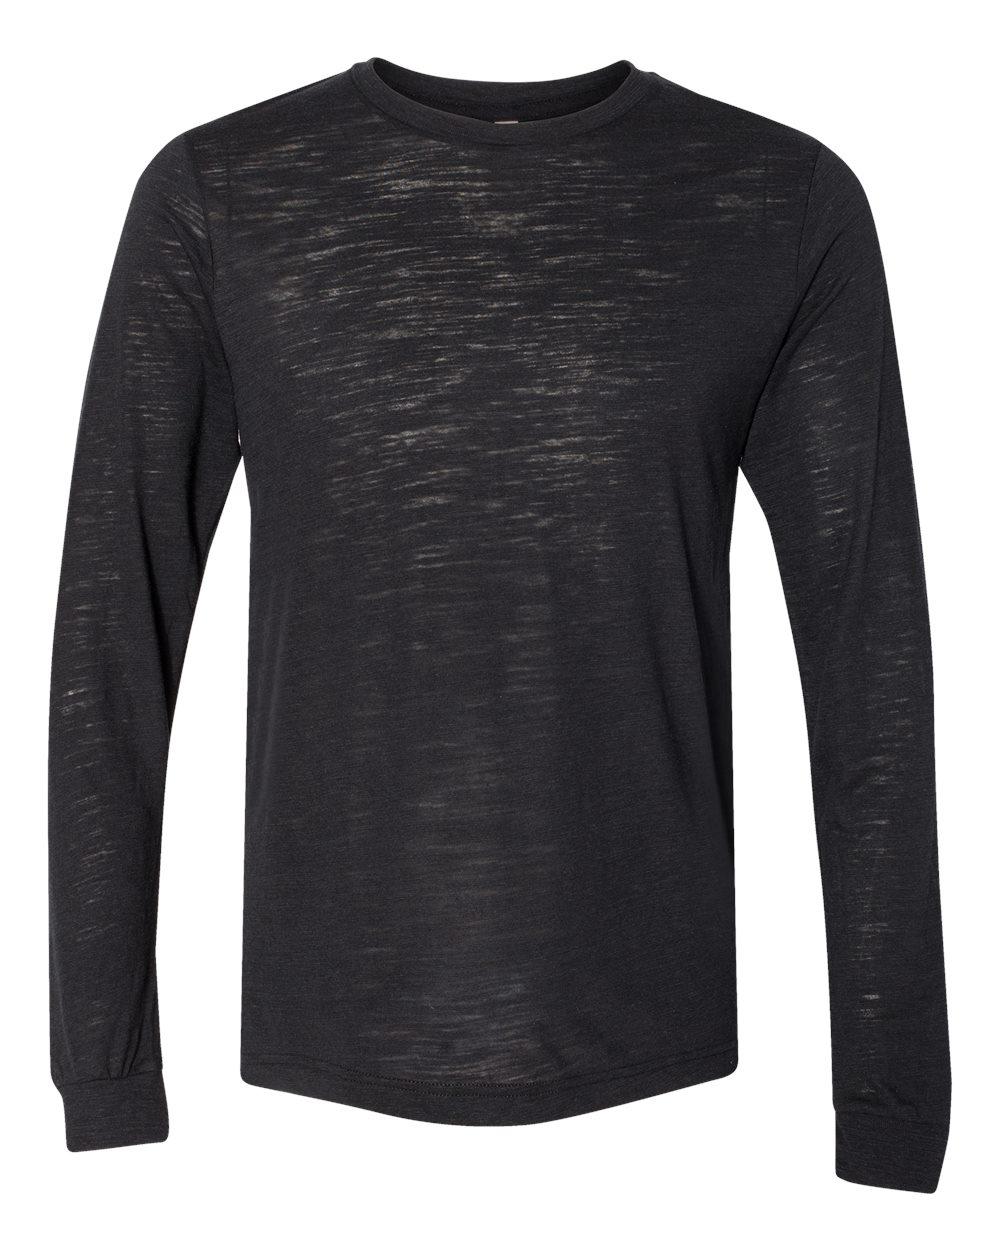 Bella-Canvas-Mens-Blank-Top-Long-Sleeve-Jersey-Tee-T-Shirt-3501-up-to-3XL thumbnail 101